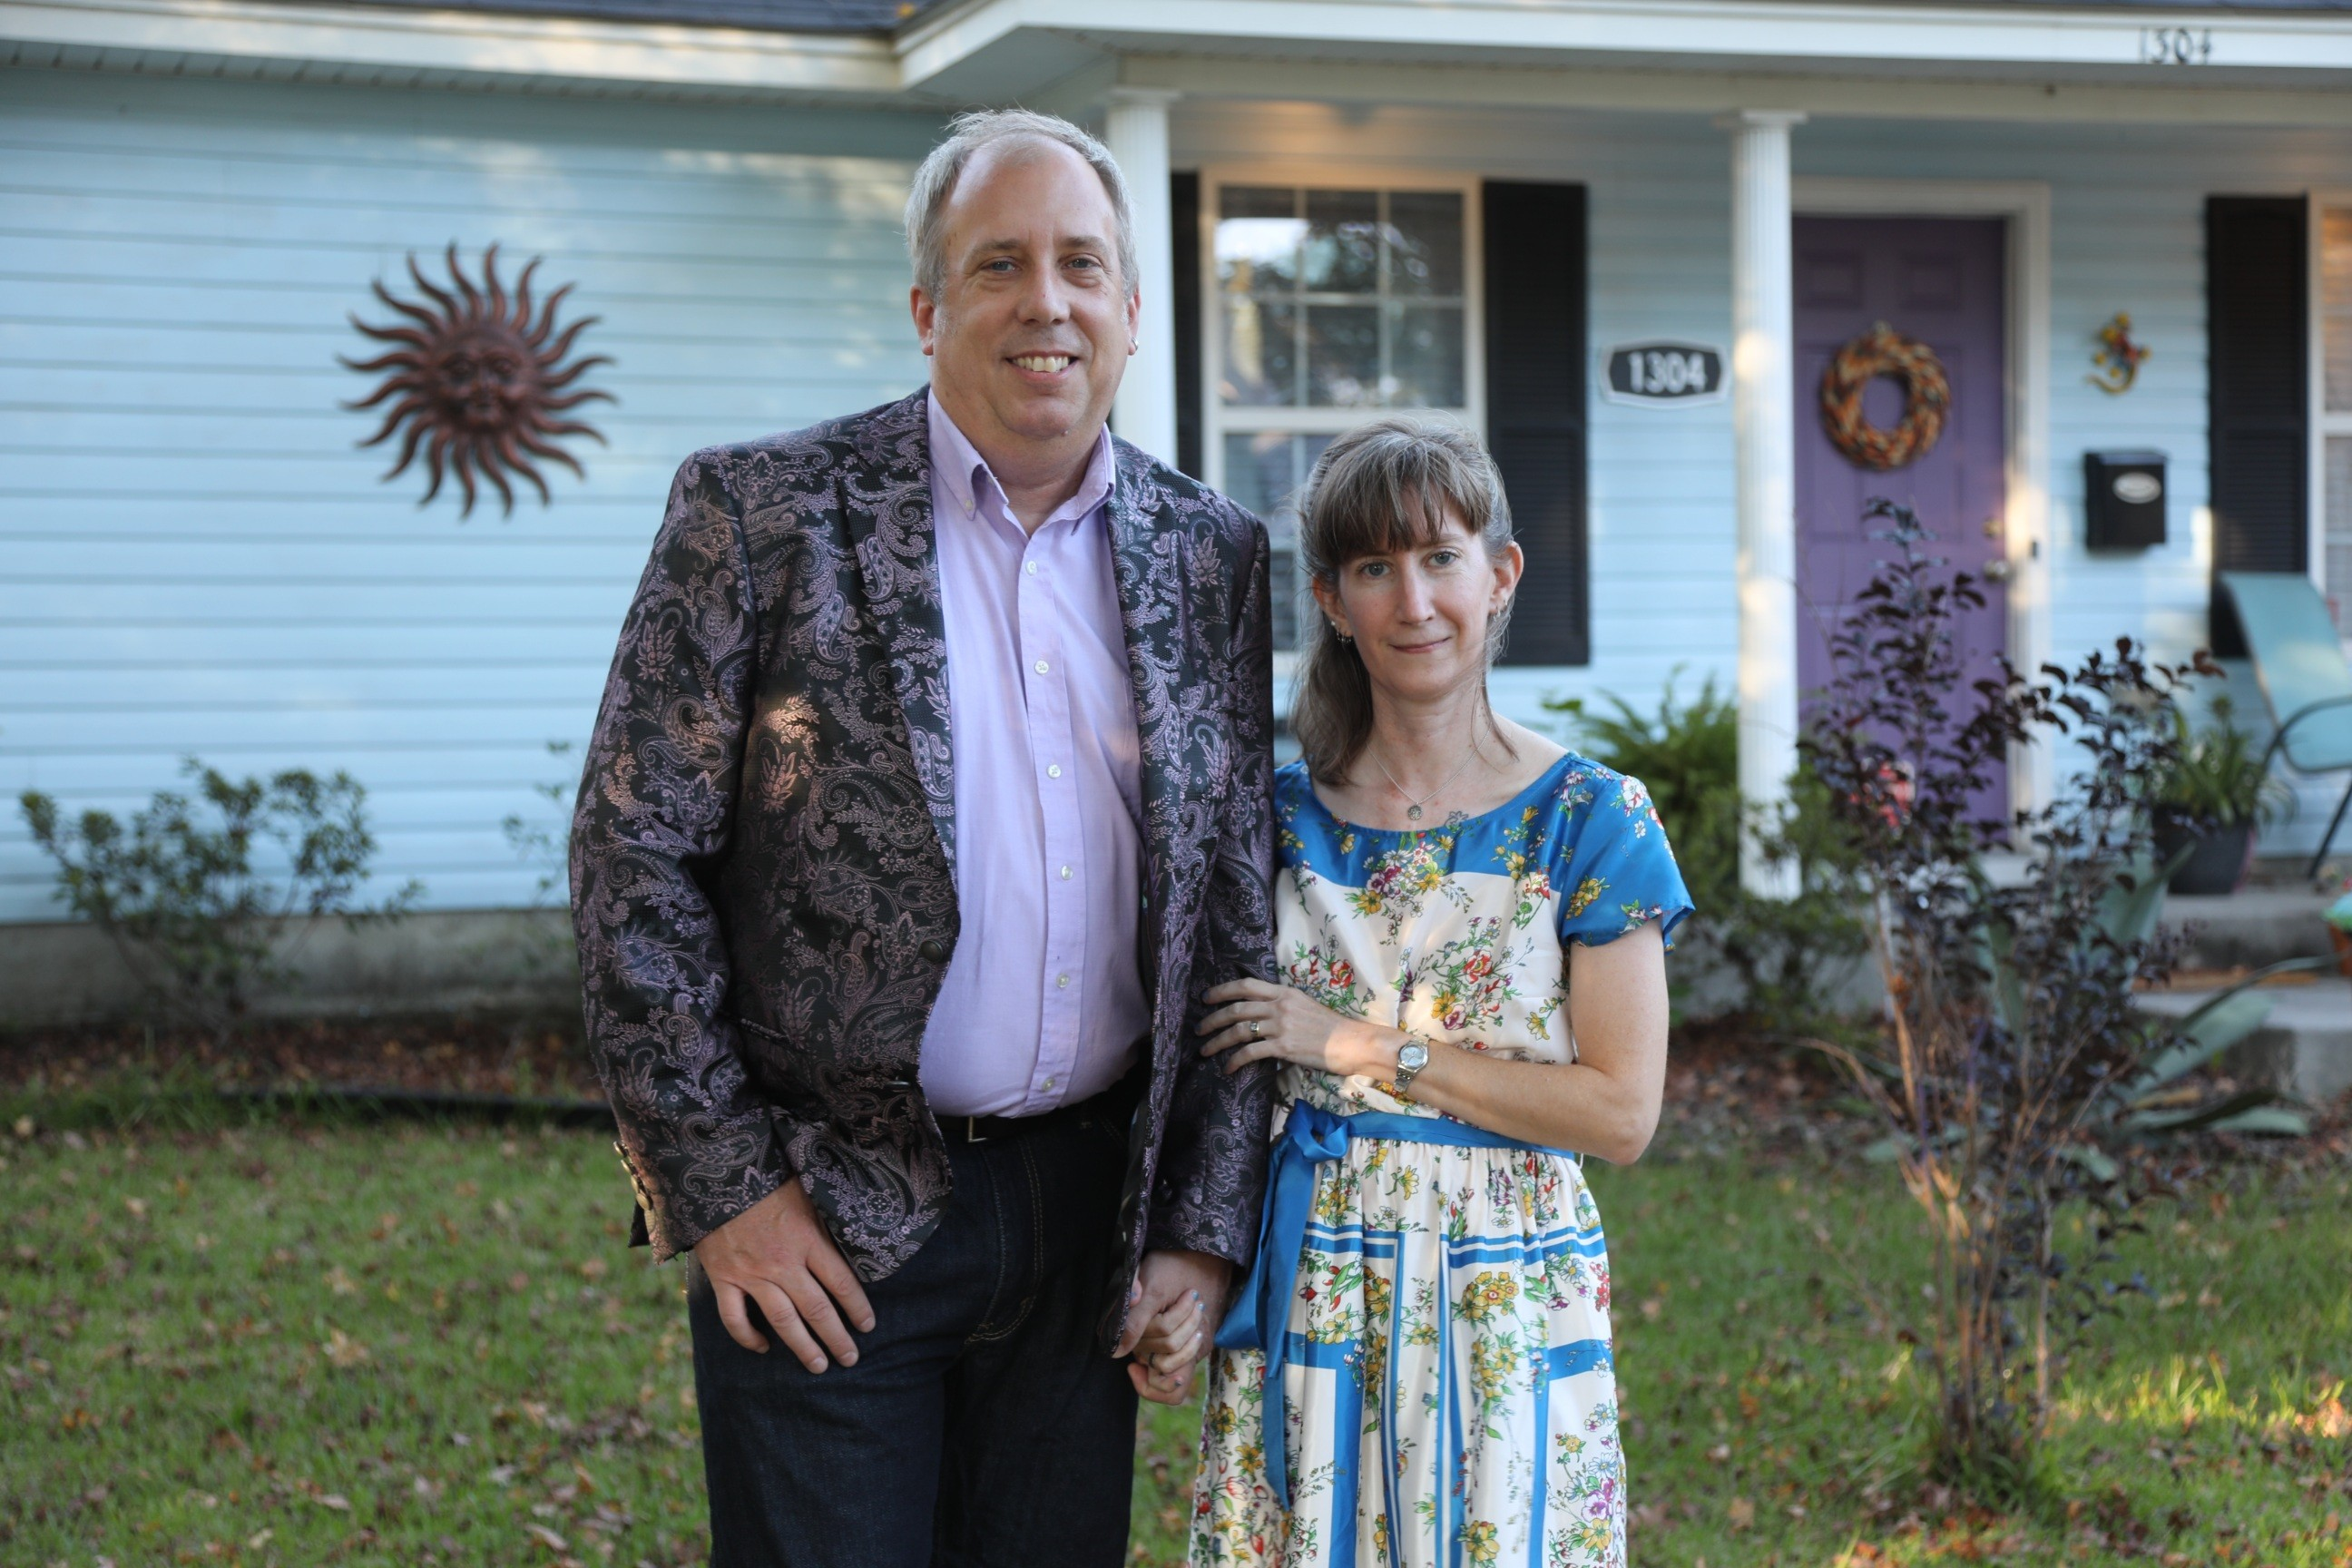 Douglas Morse and Elizabeth Raley. Photo credit Frank Logue.